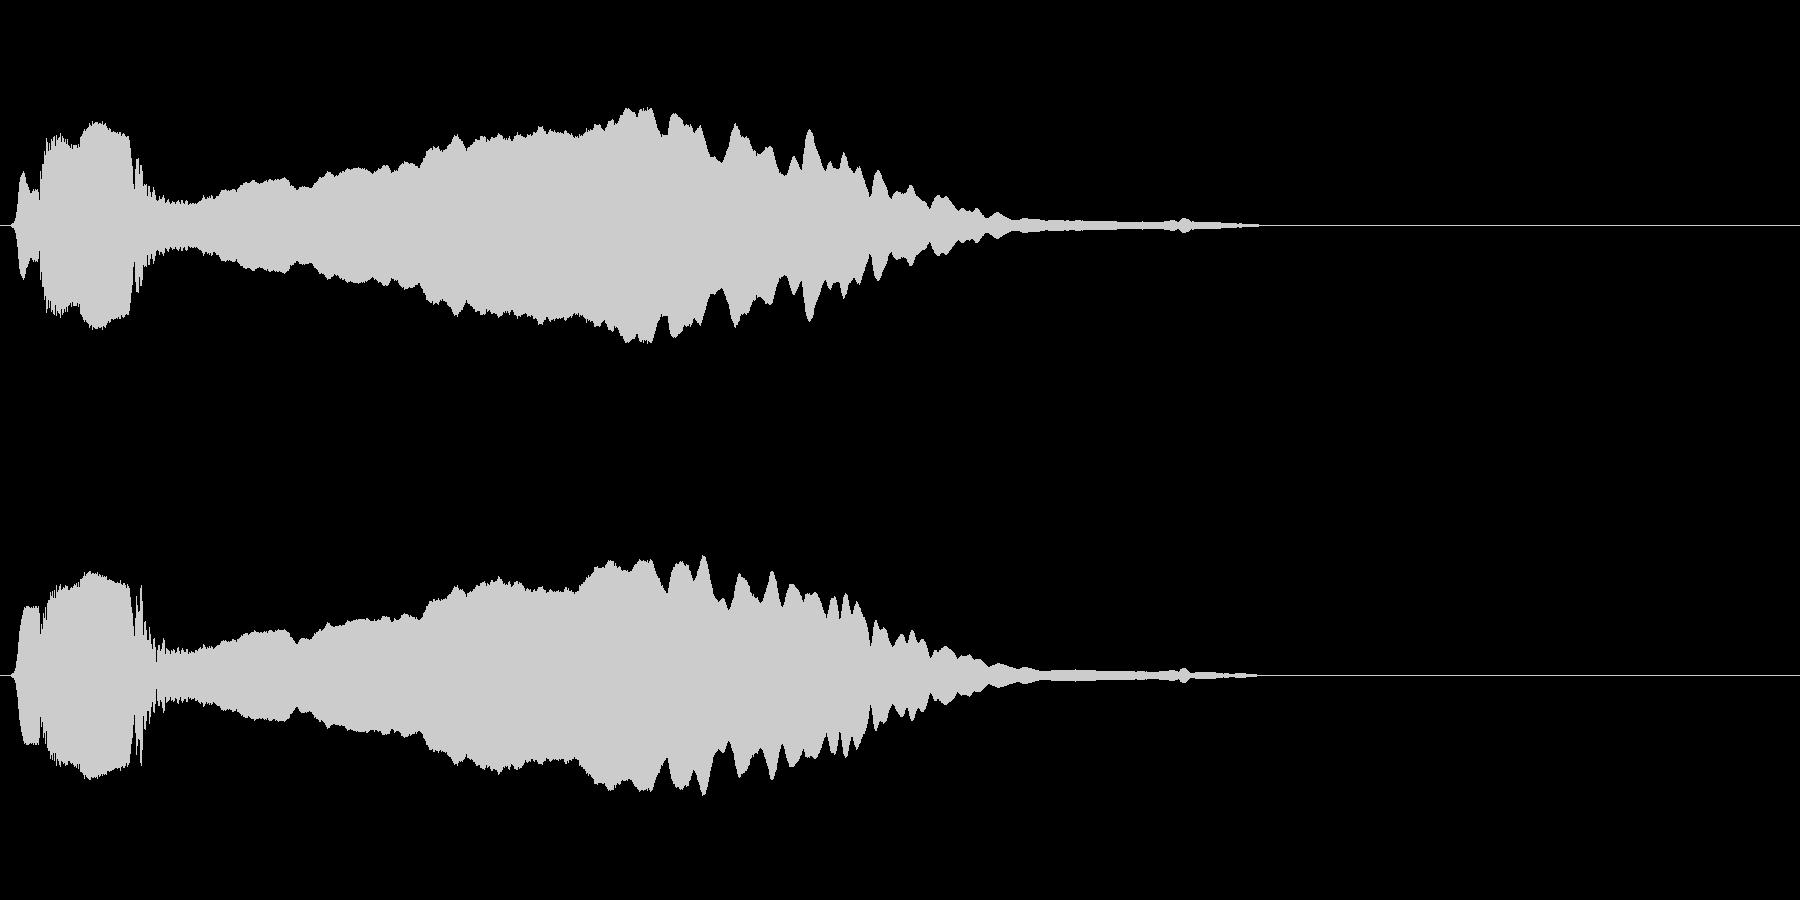 尺八 生演奏 古典風#2の未再生の波形